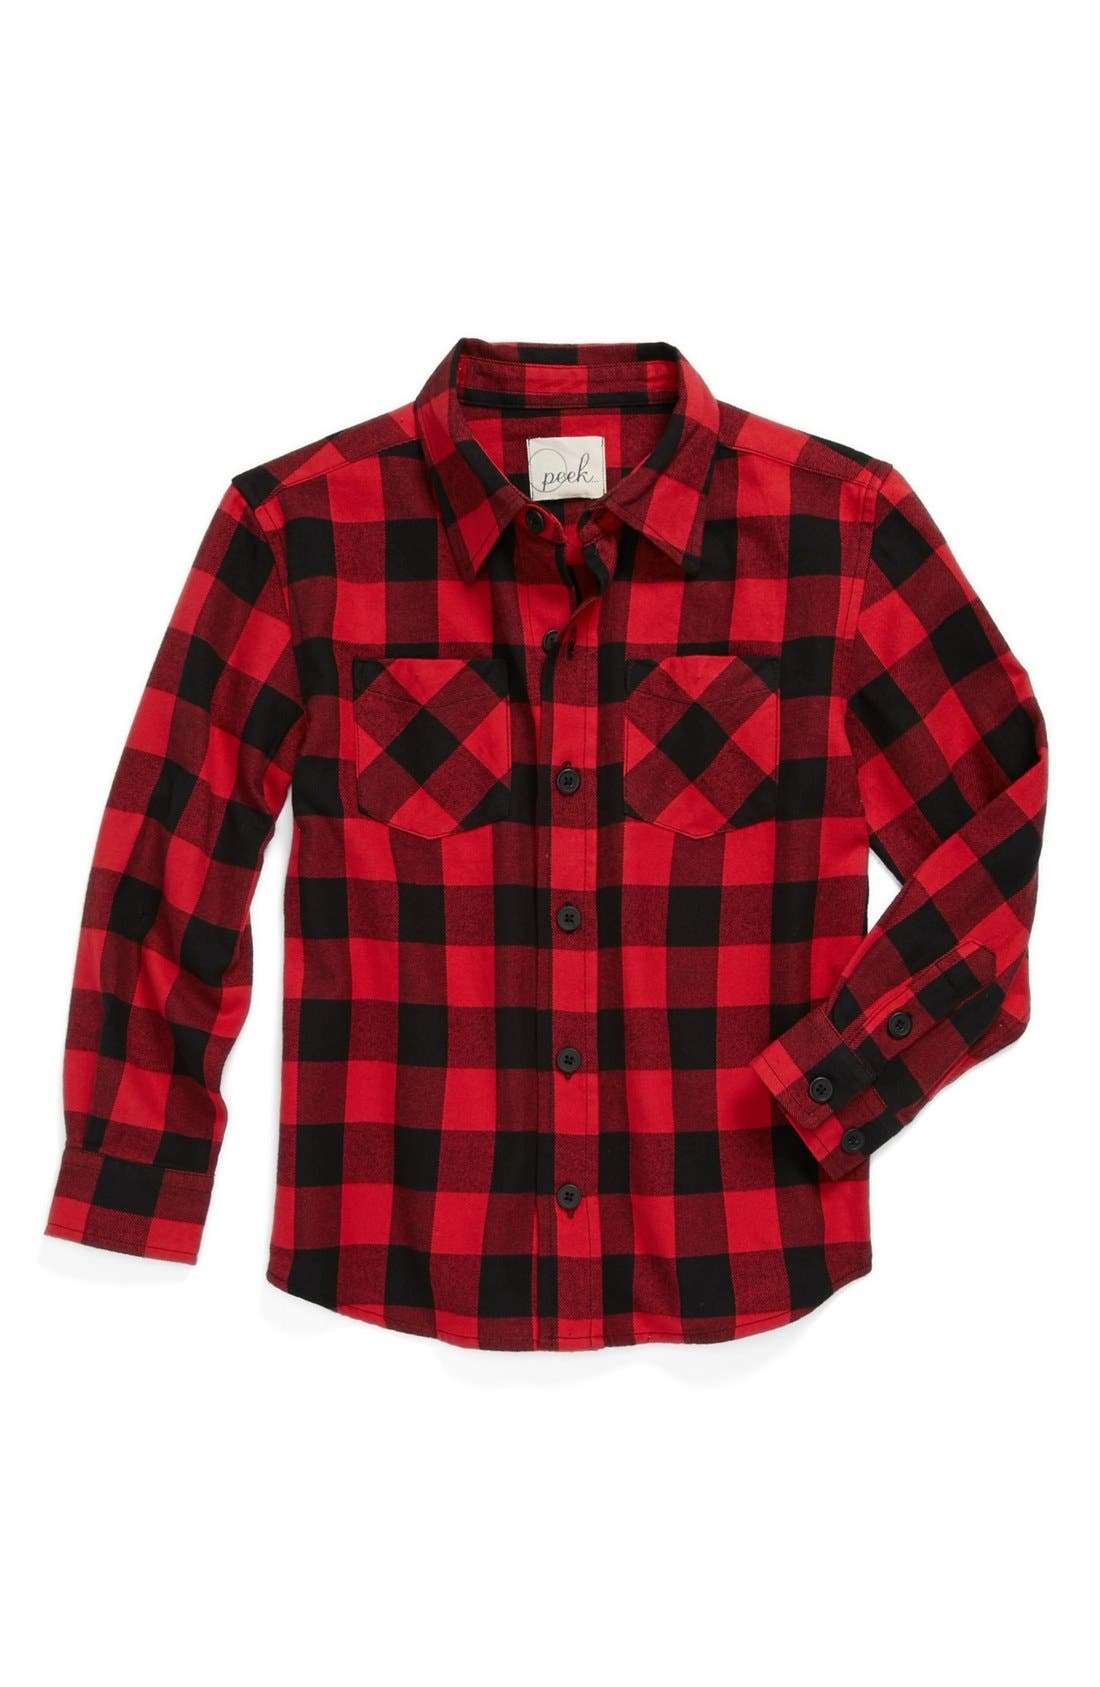 Alternate Image 1 Selected - Peek 'Buffalo' Plaid Shirt (Toddler Boys, Little Boys & Big Boys)